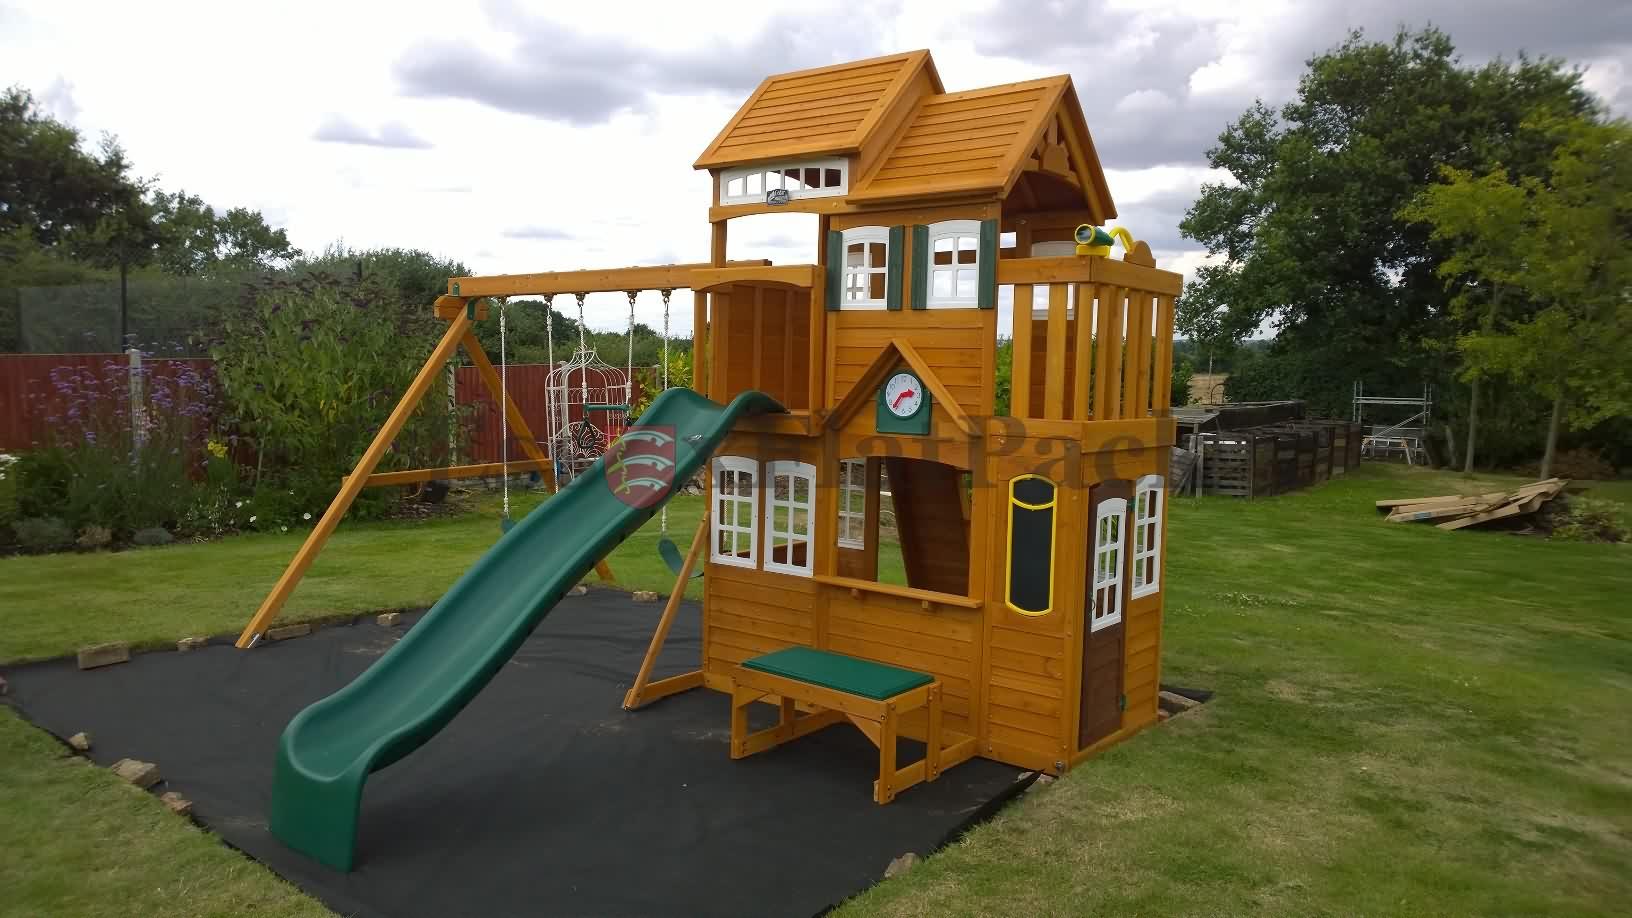 essexflatpack-playhouse-20160805144513.jpg